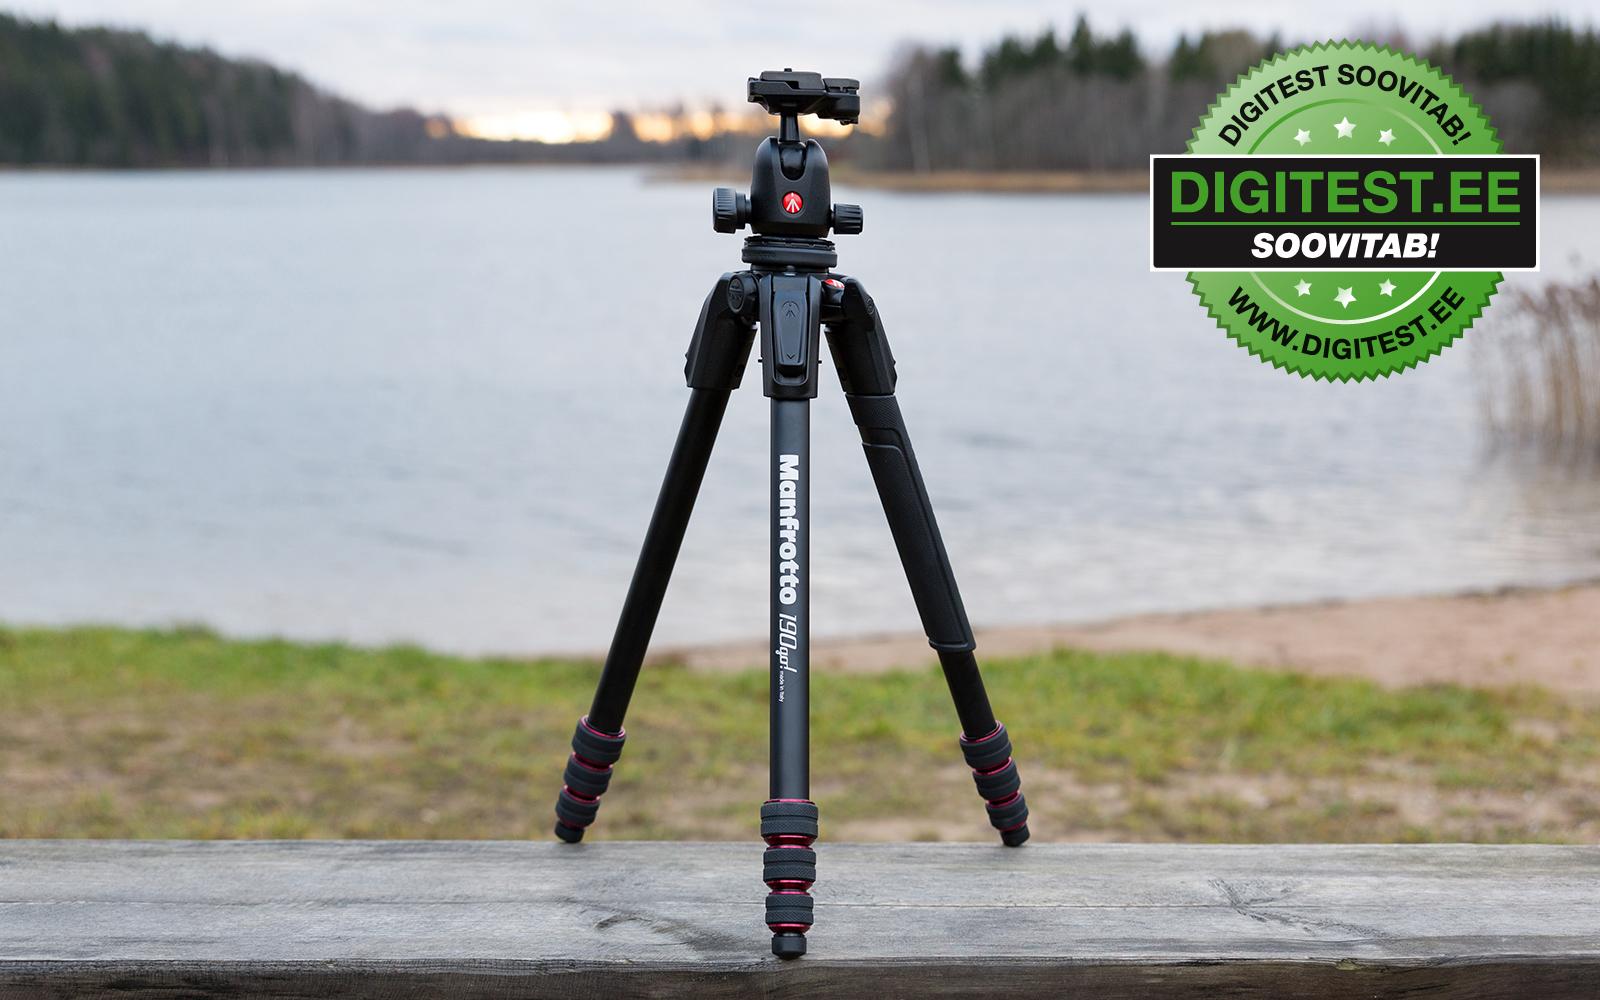 MK190GOA4TB-BH-018-digitestsoovitab